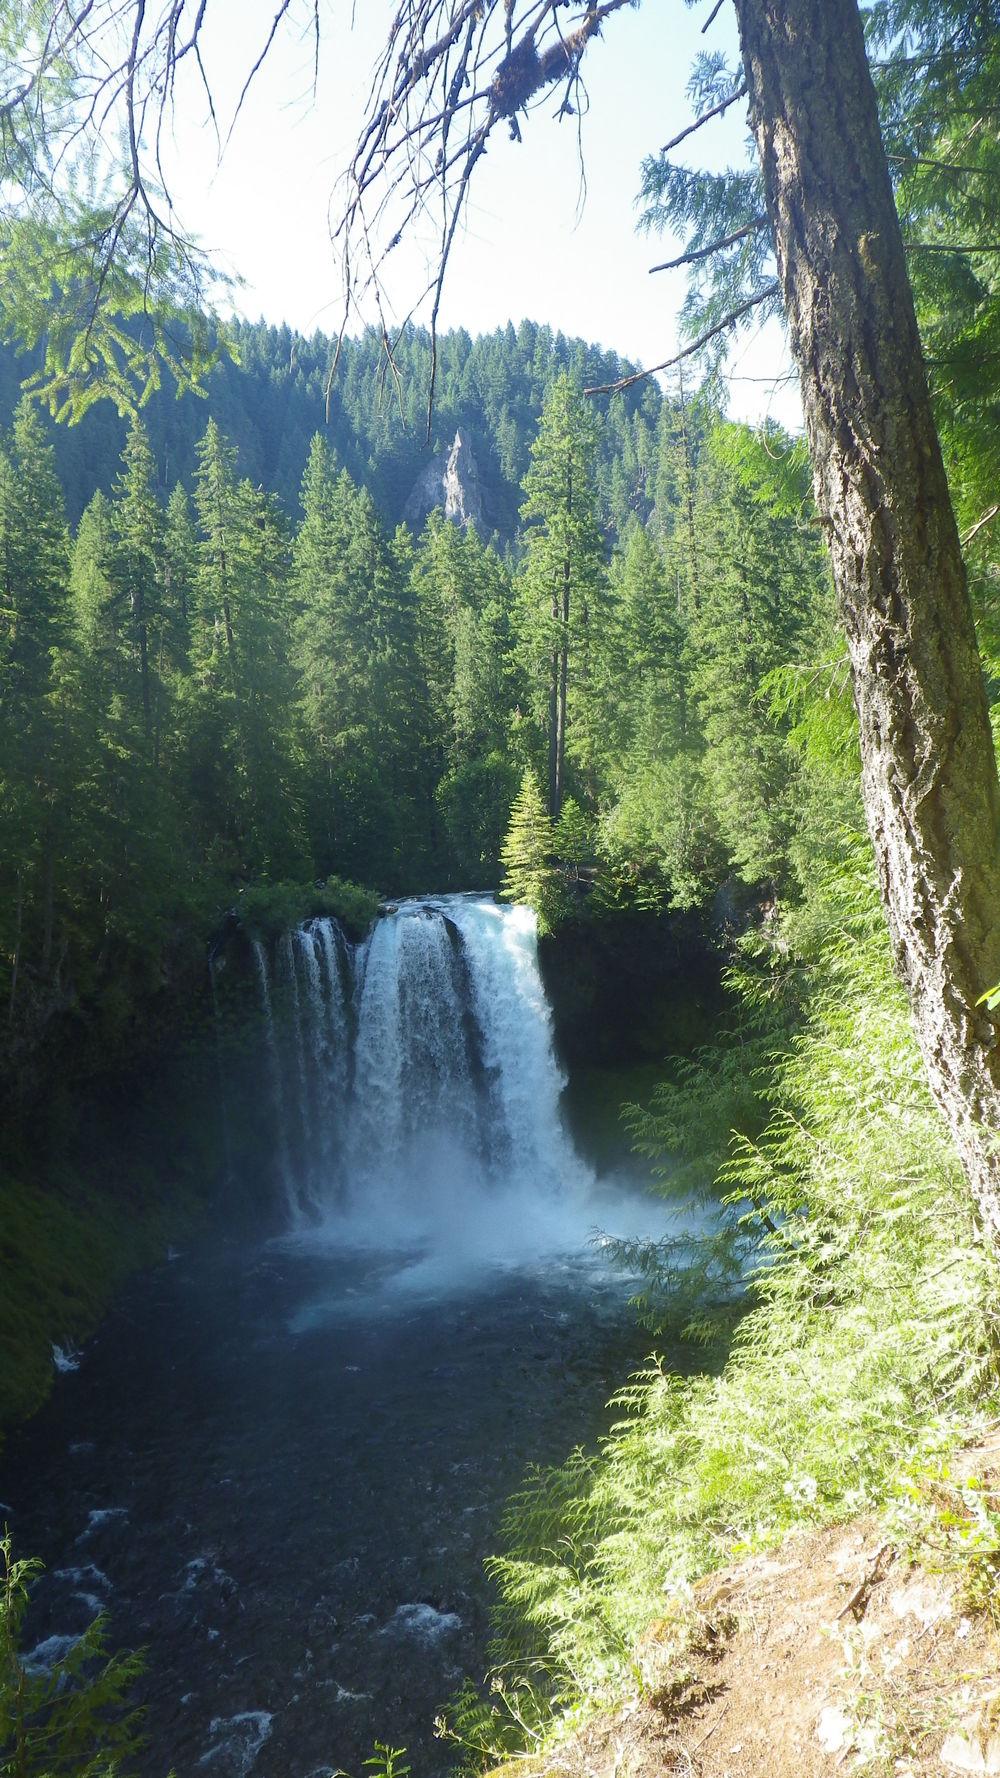 Koosah Falls (click for larger image)